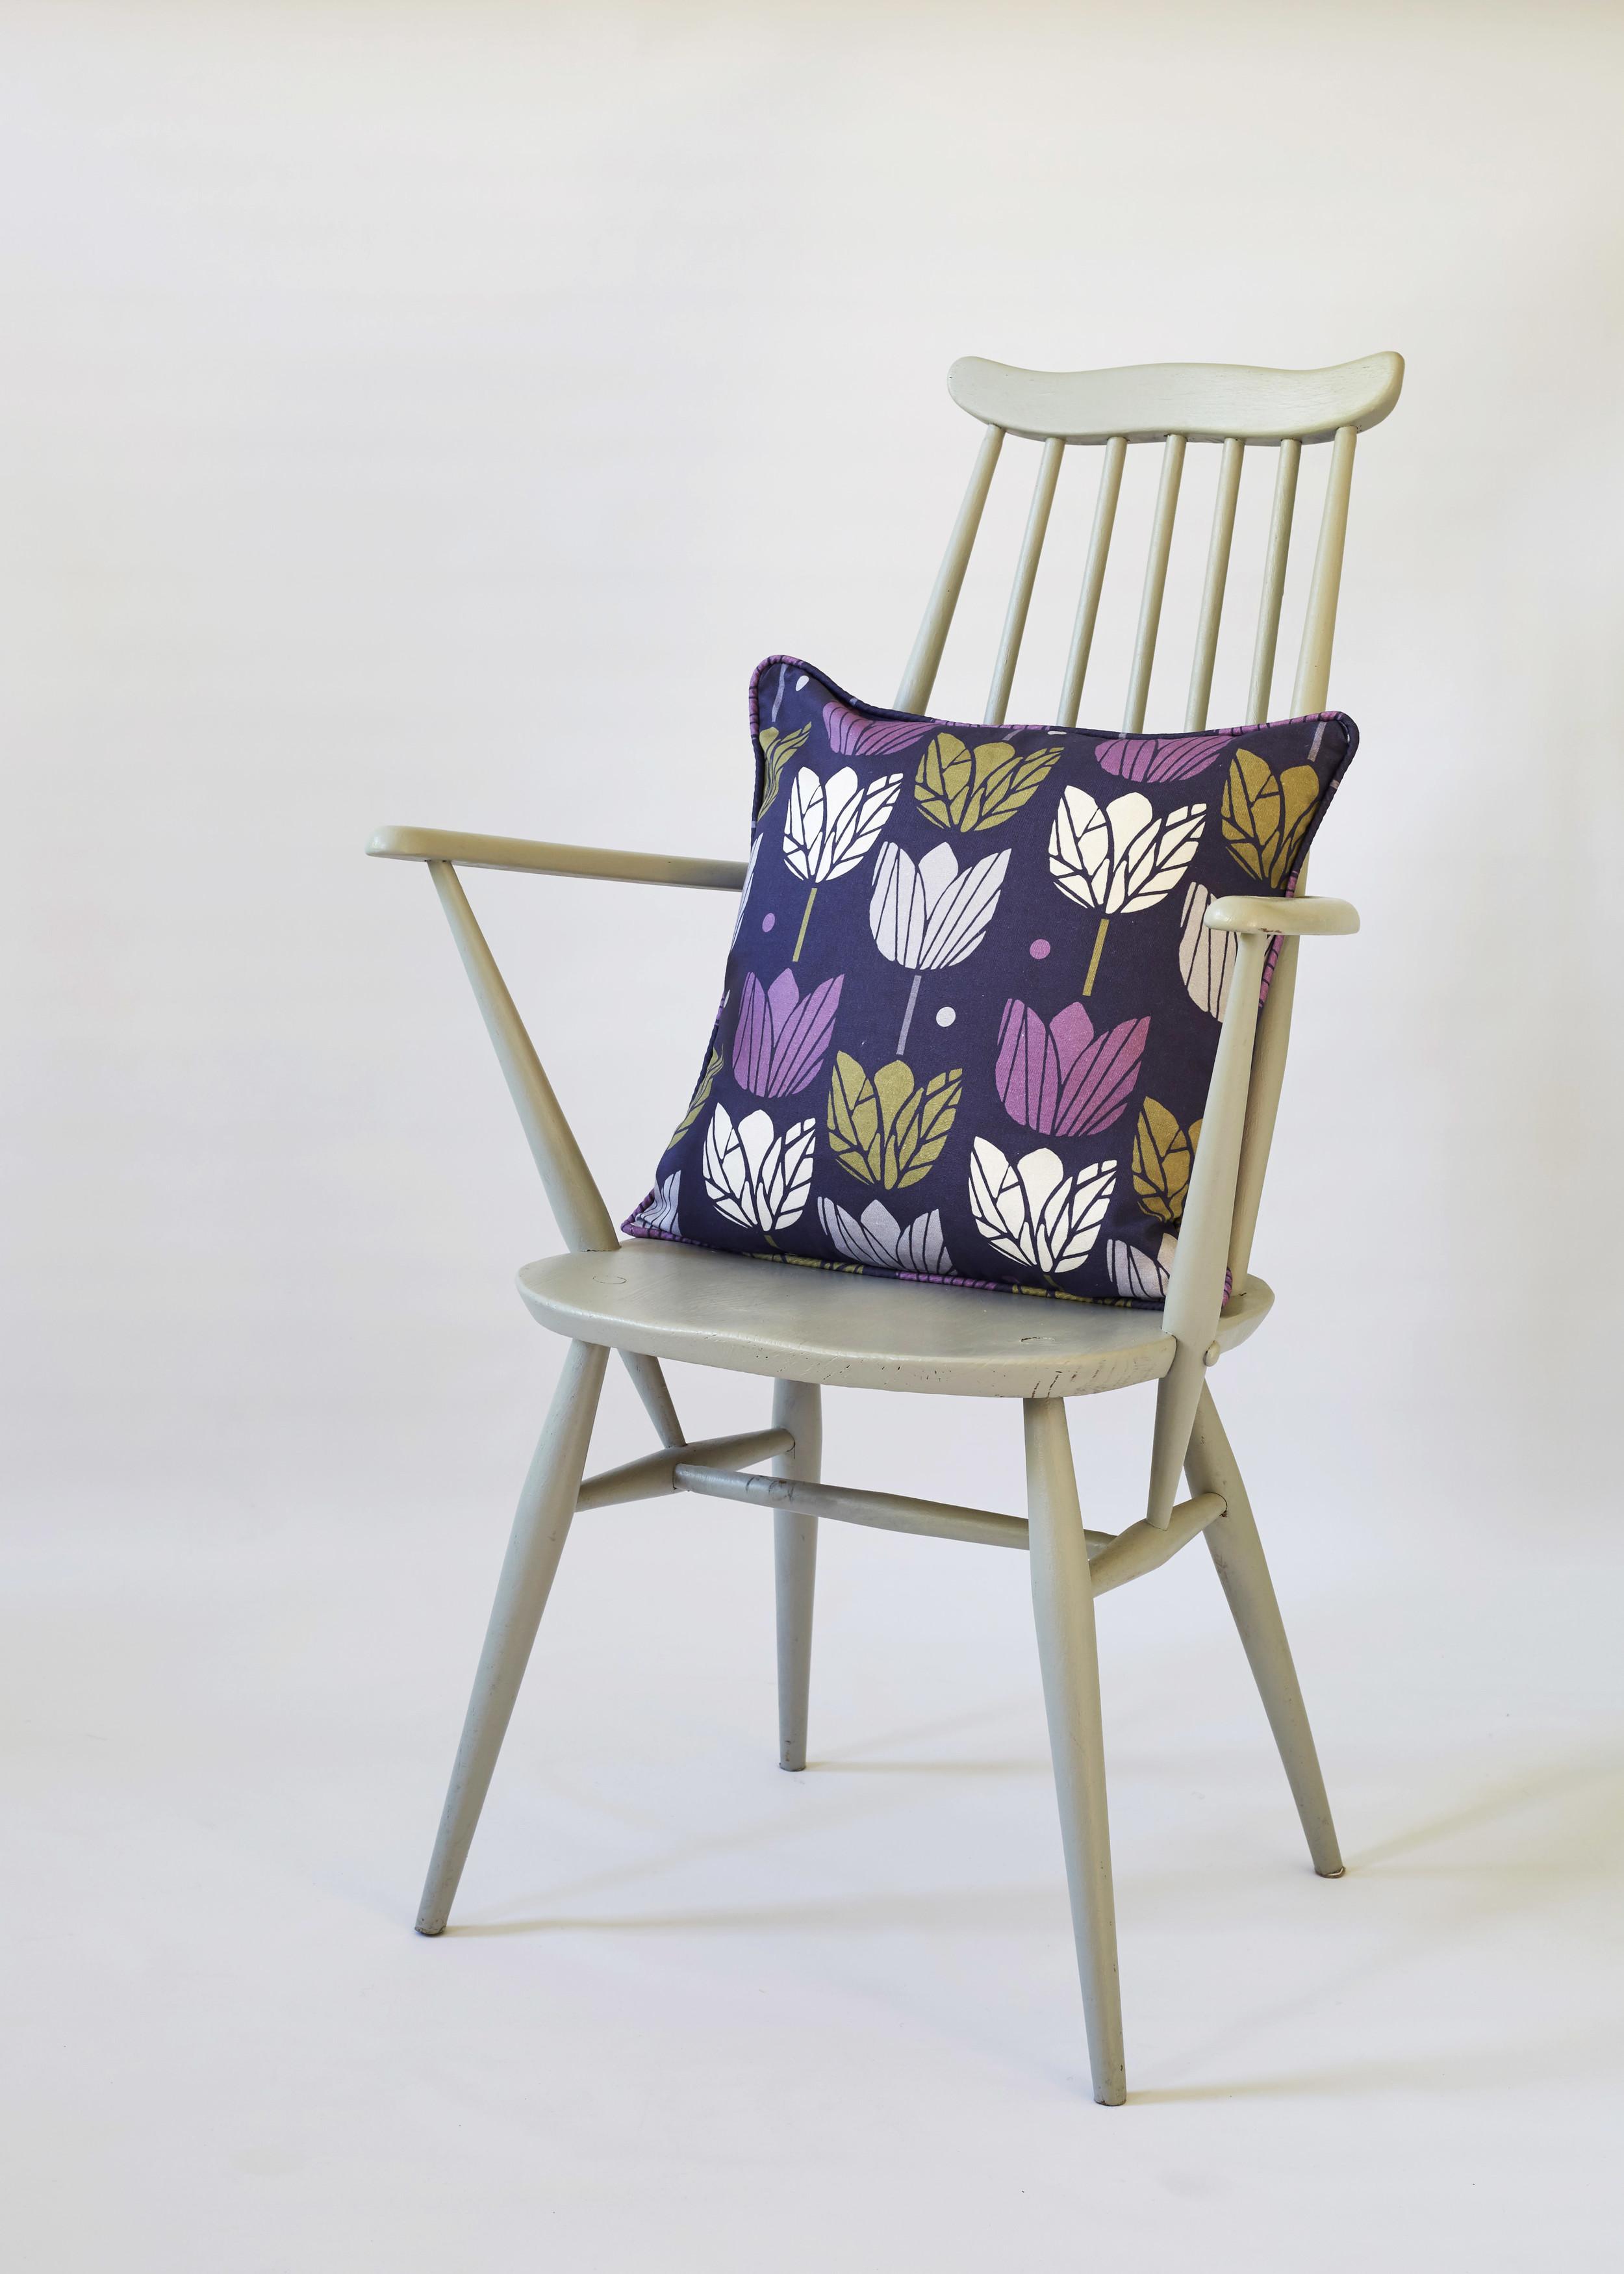 cushion in purple tulips fabric.jpg